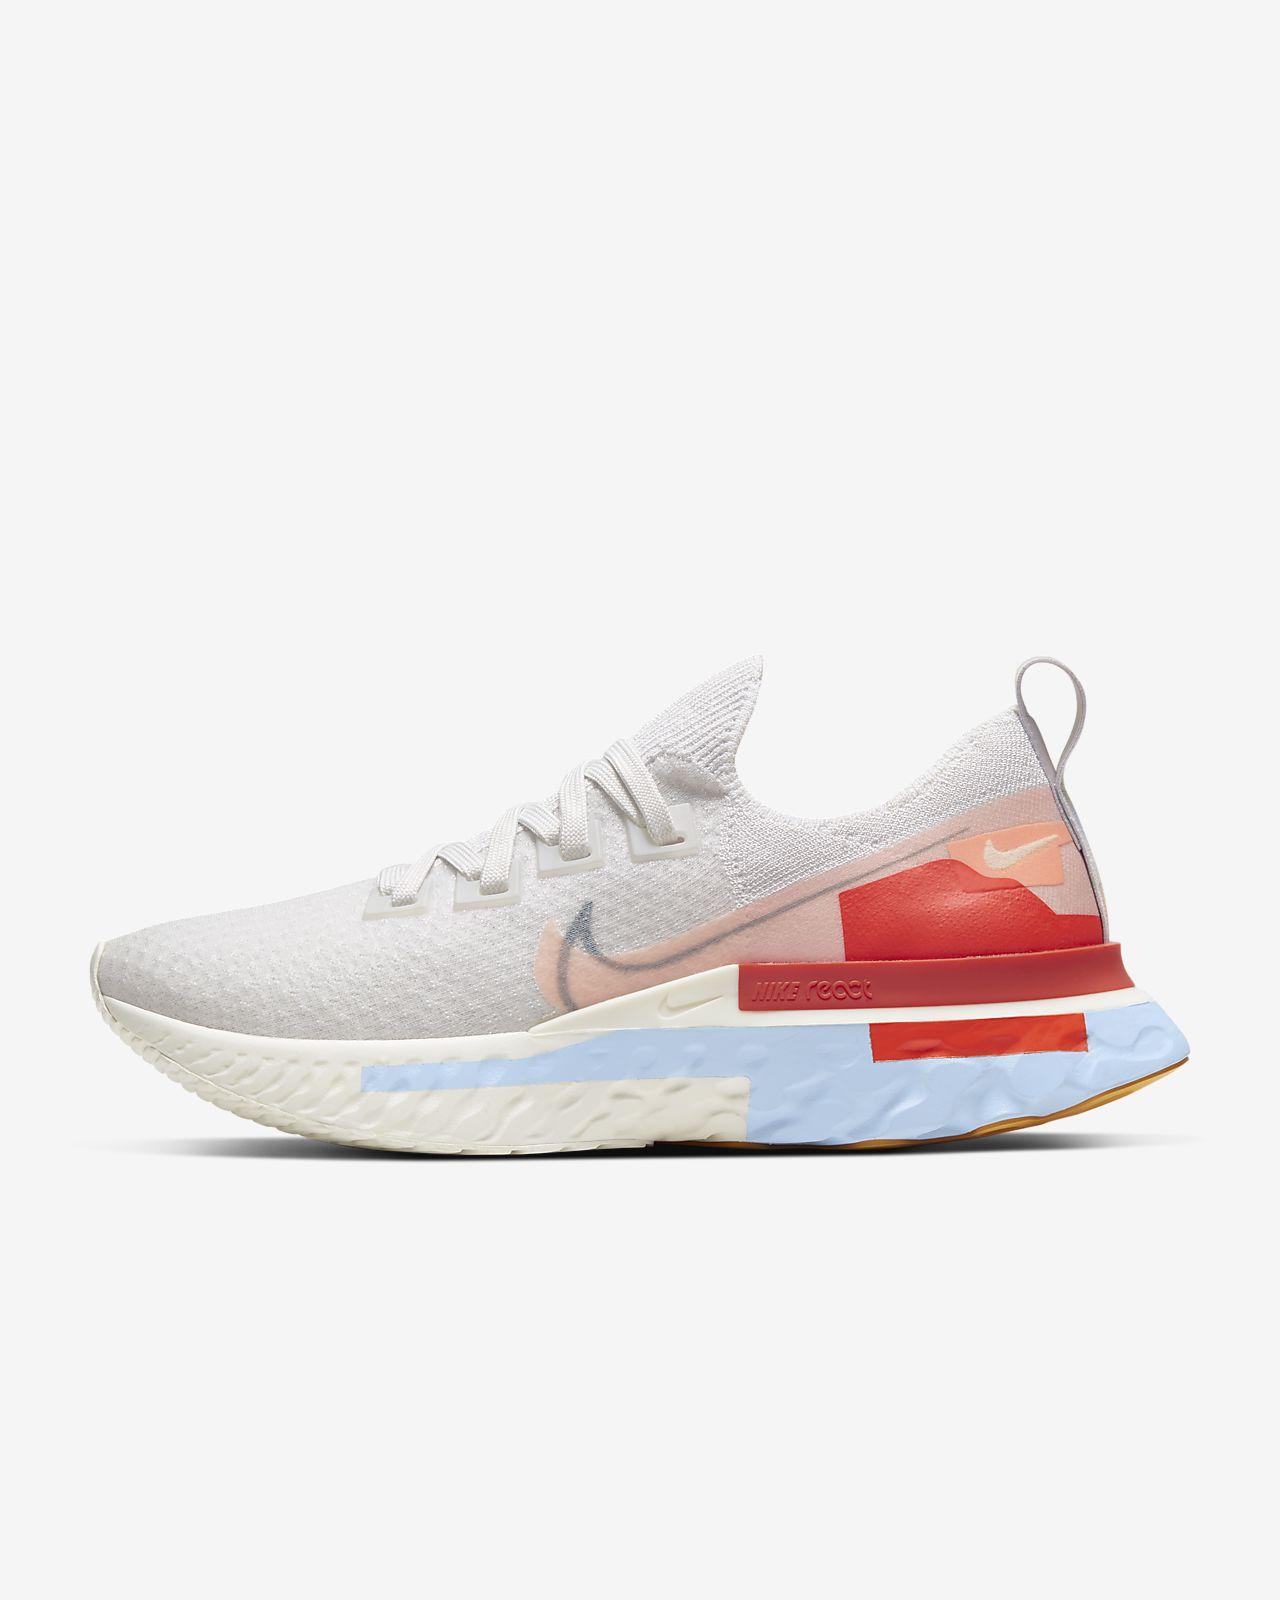 Sapatilhas de running Nike React Infinity Run Flyknit Premium para mulher